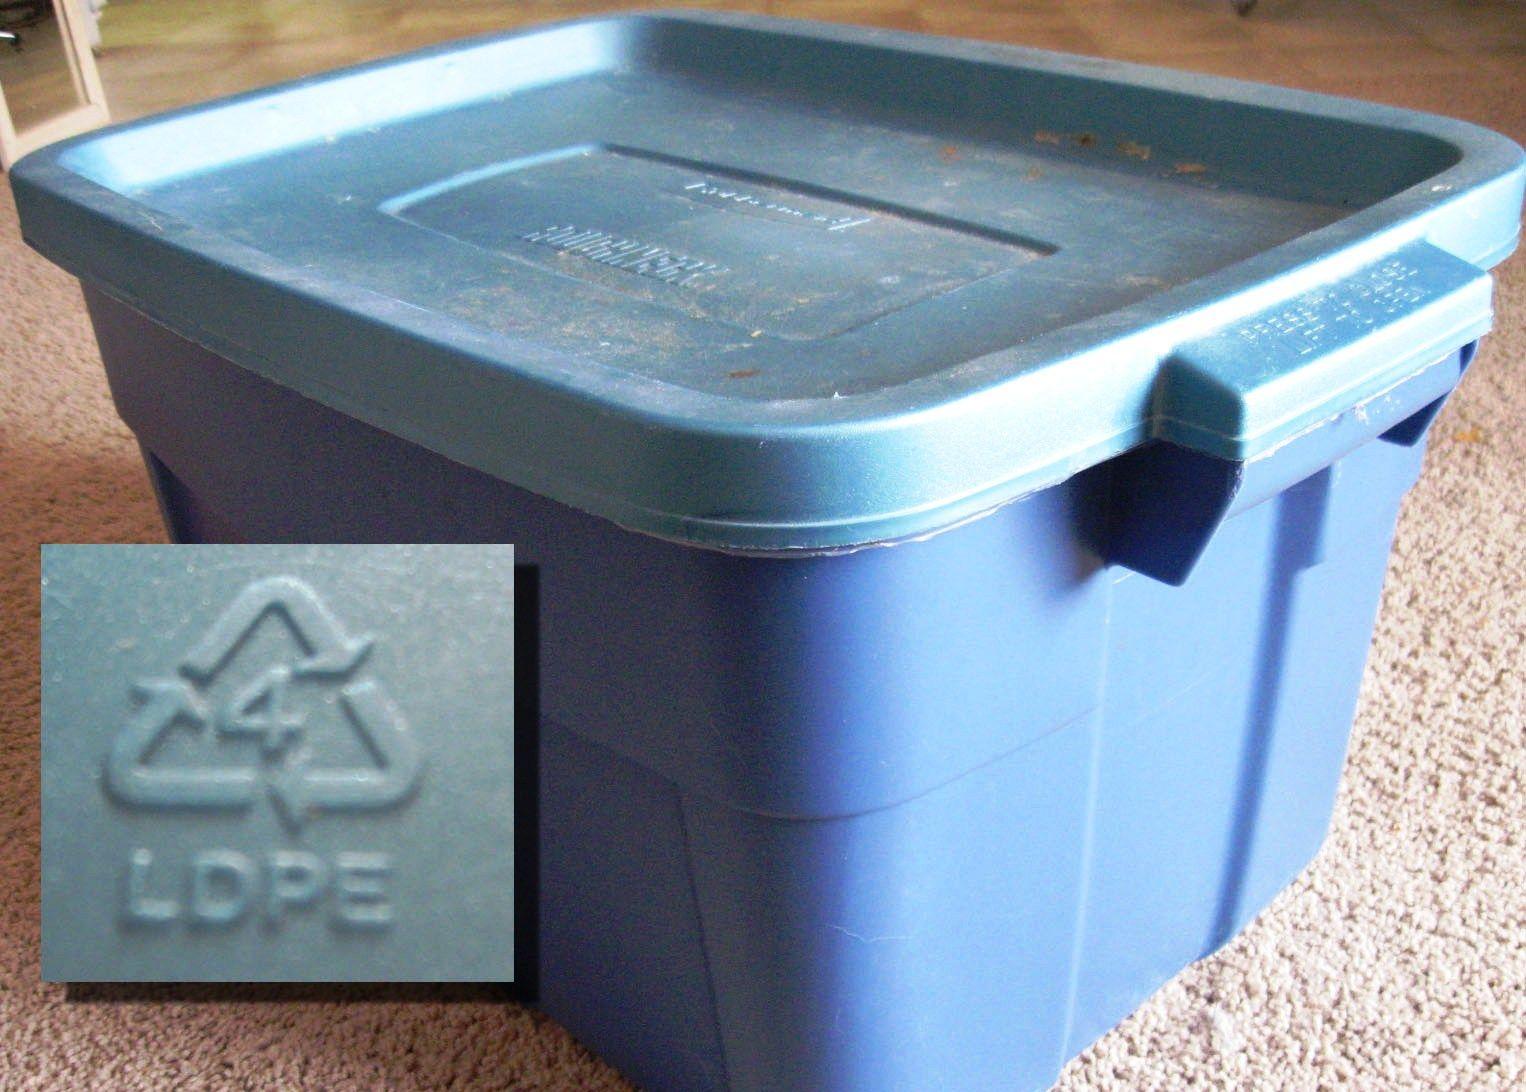 18 gallon food grade bucket - plastic type 4 | Recipes to Cook ...